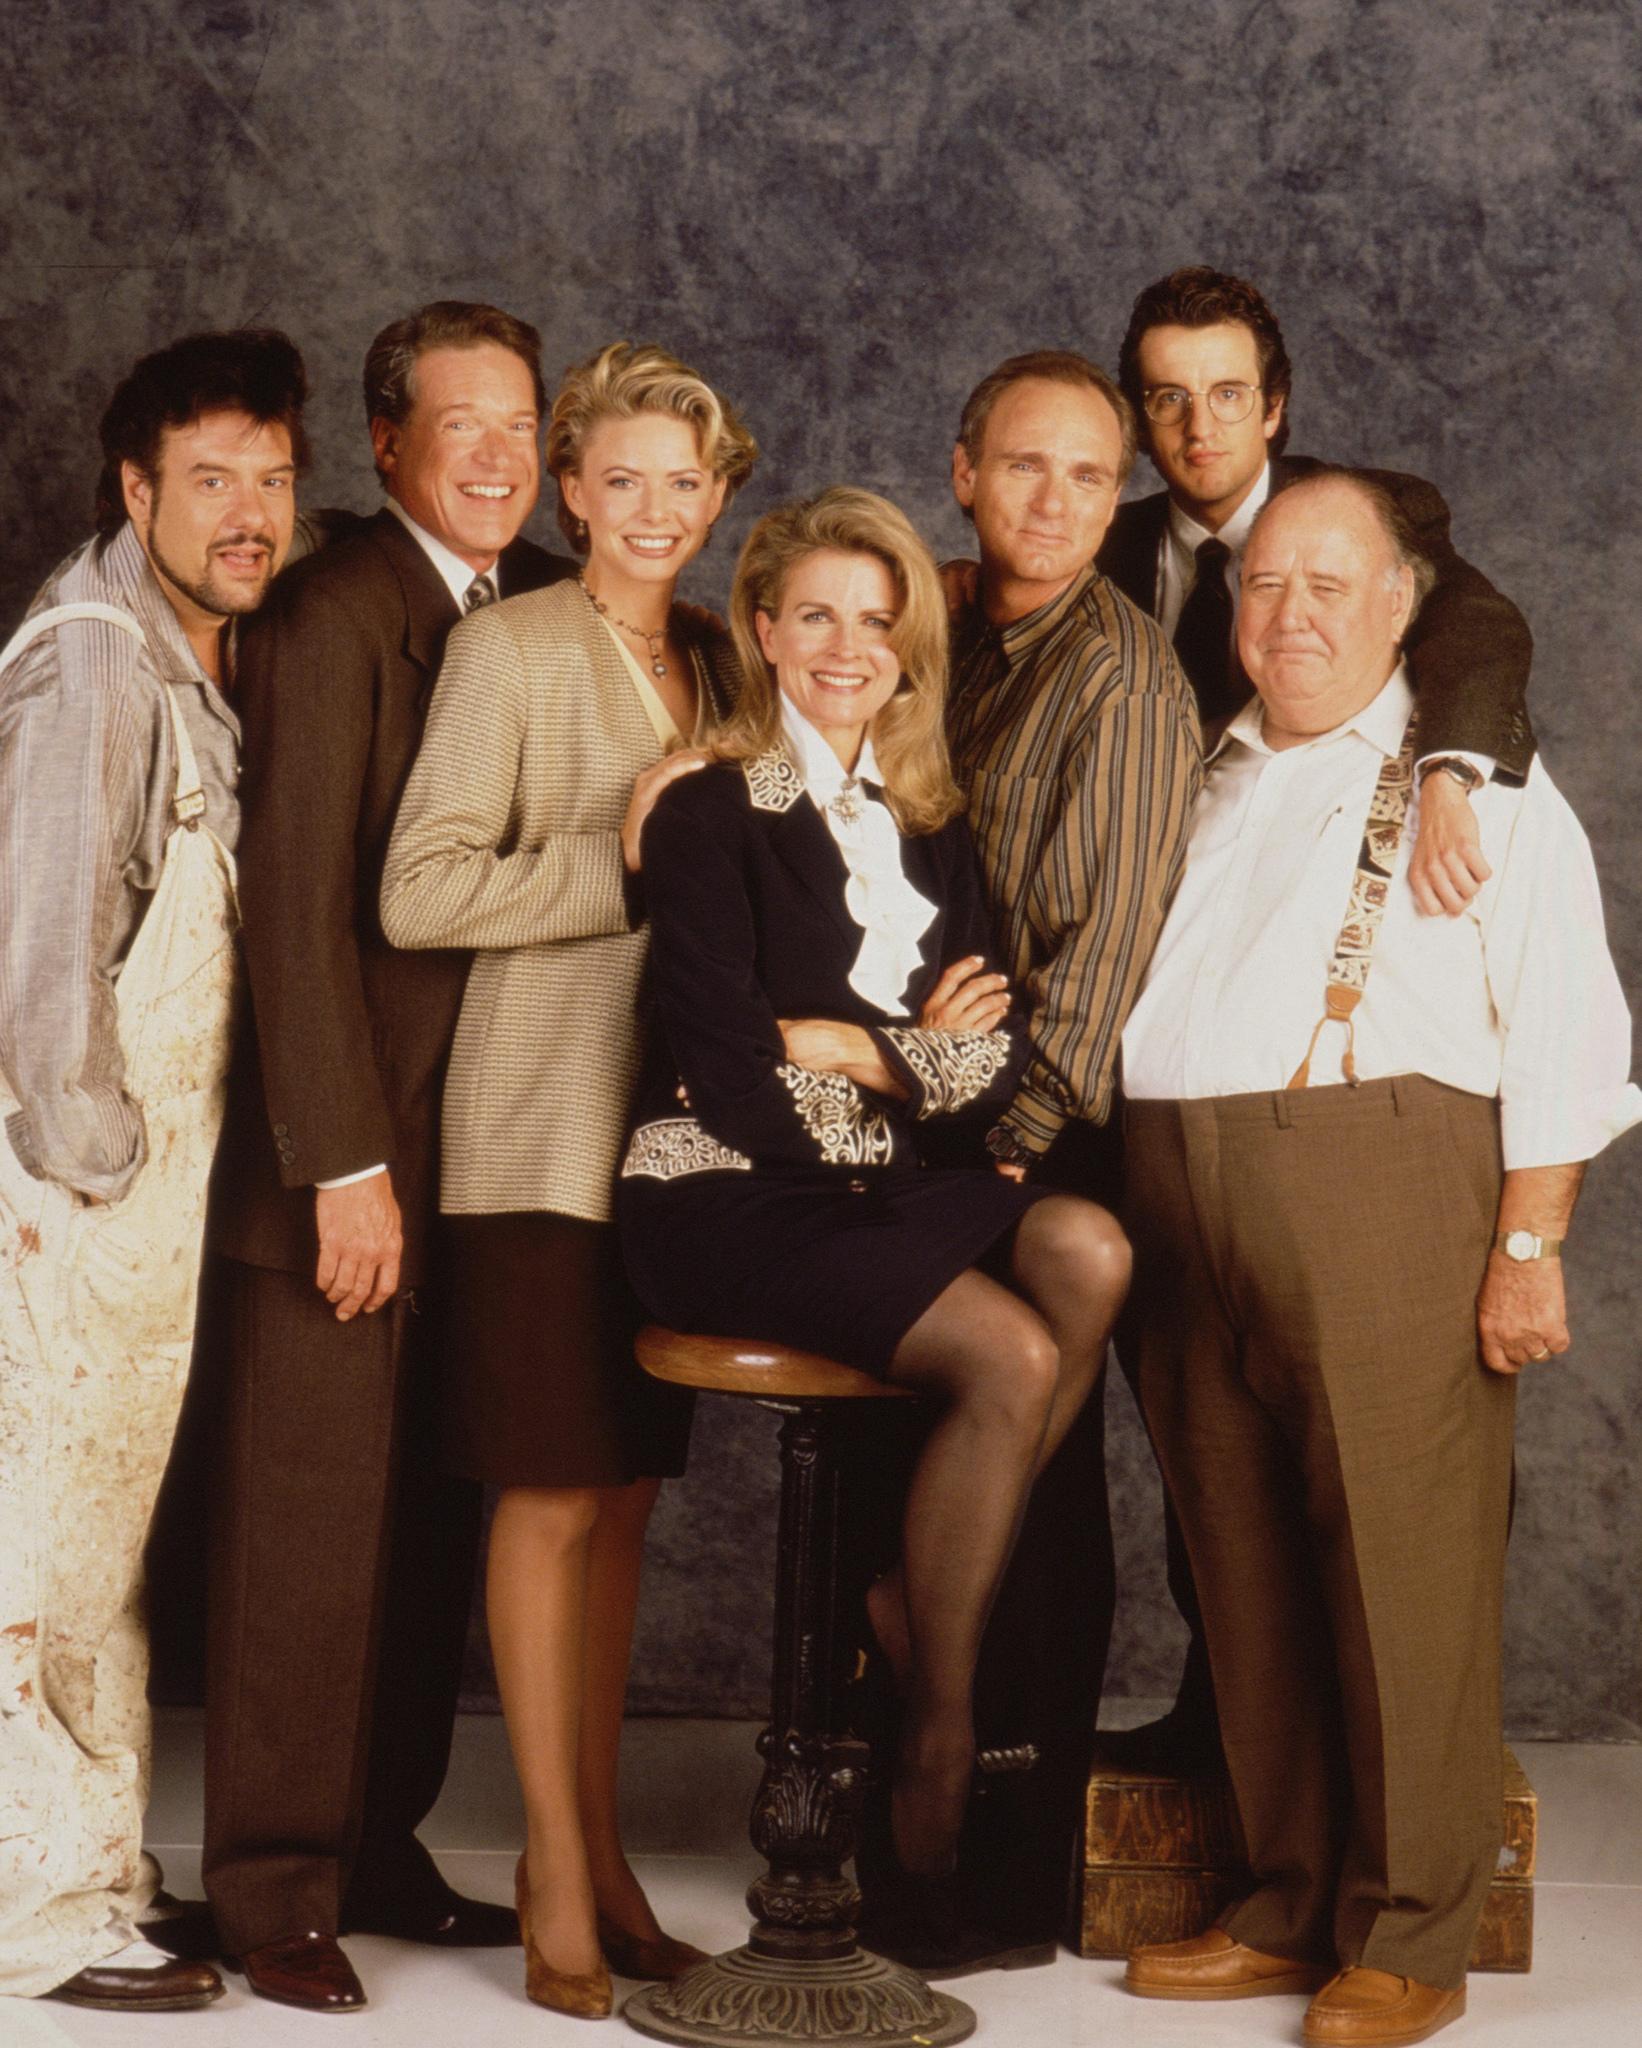 Candice Bergen, Faith Ford, Joe Regalbuto, Pat Corley, Charles Kimbrough, Robert Pastorelli, and Grant Shaud in Murphy Brown (1988)